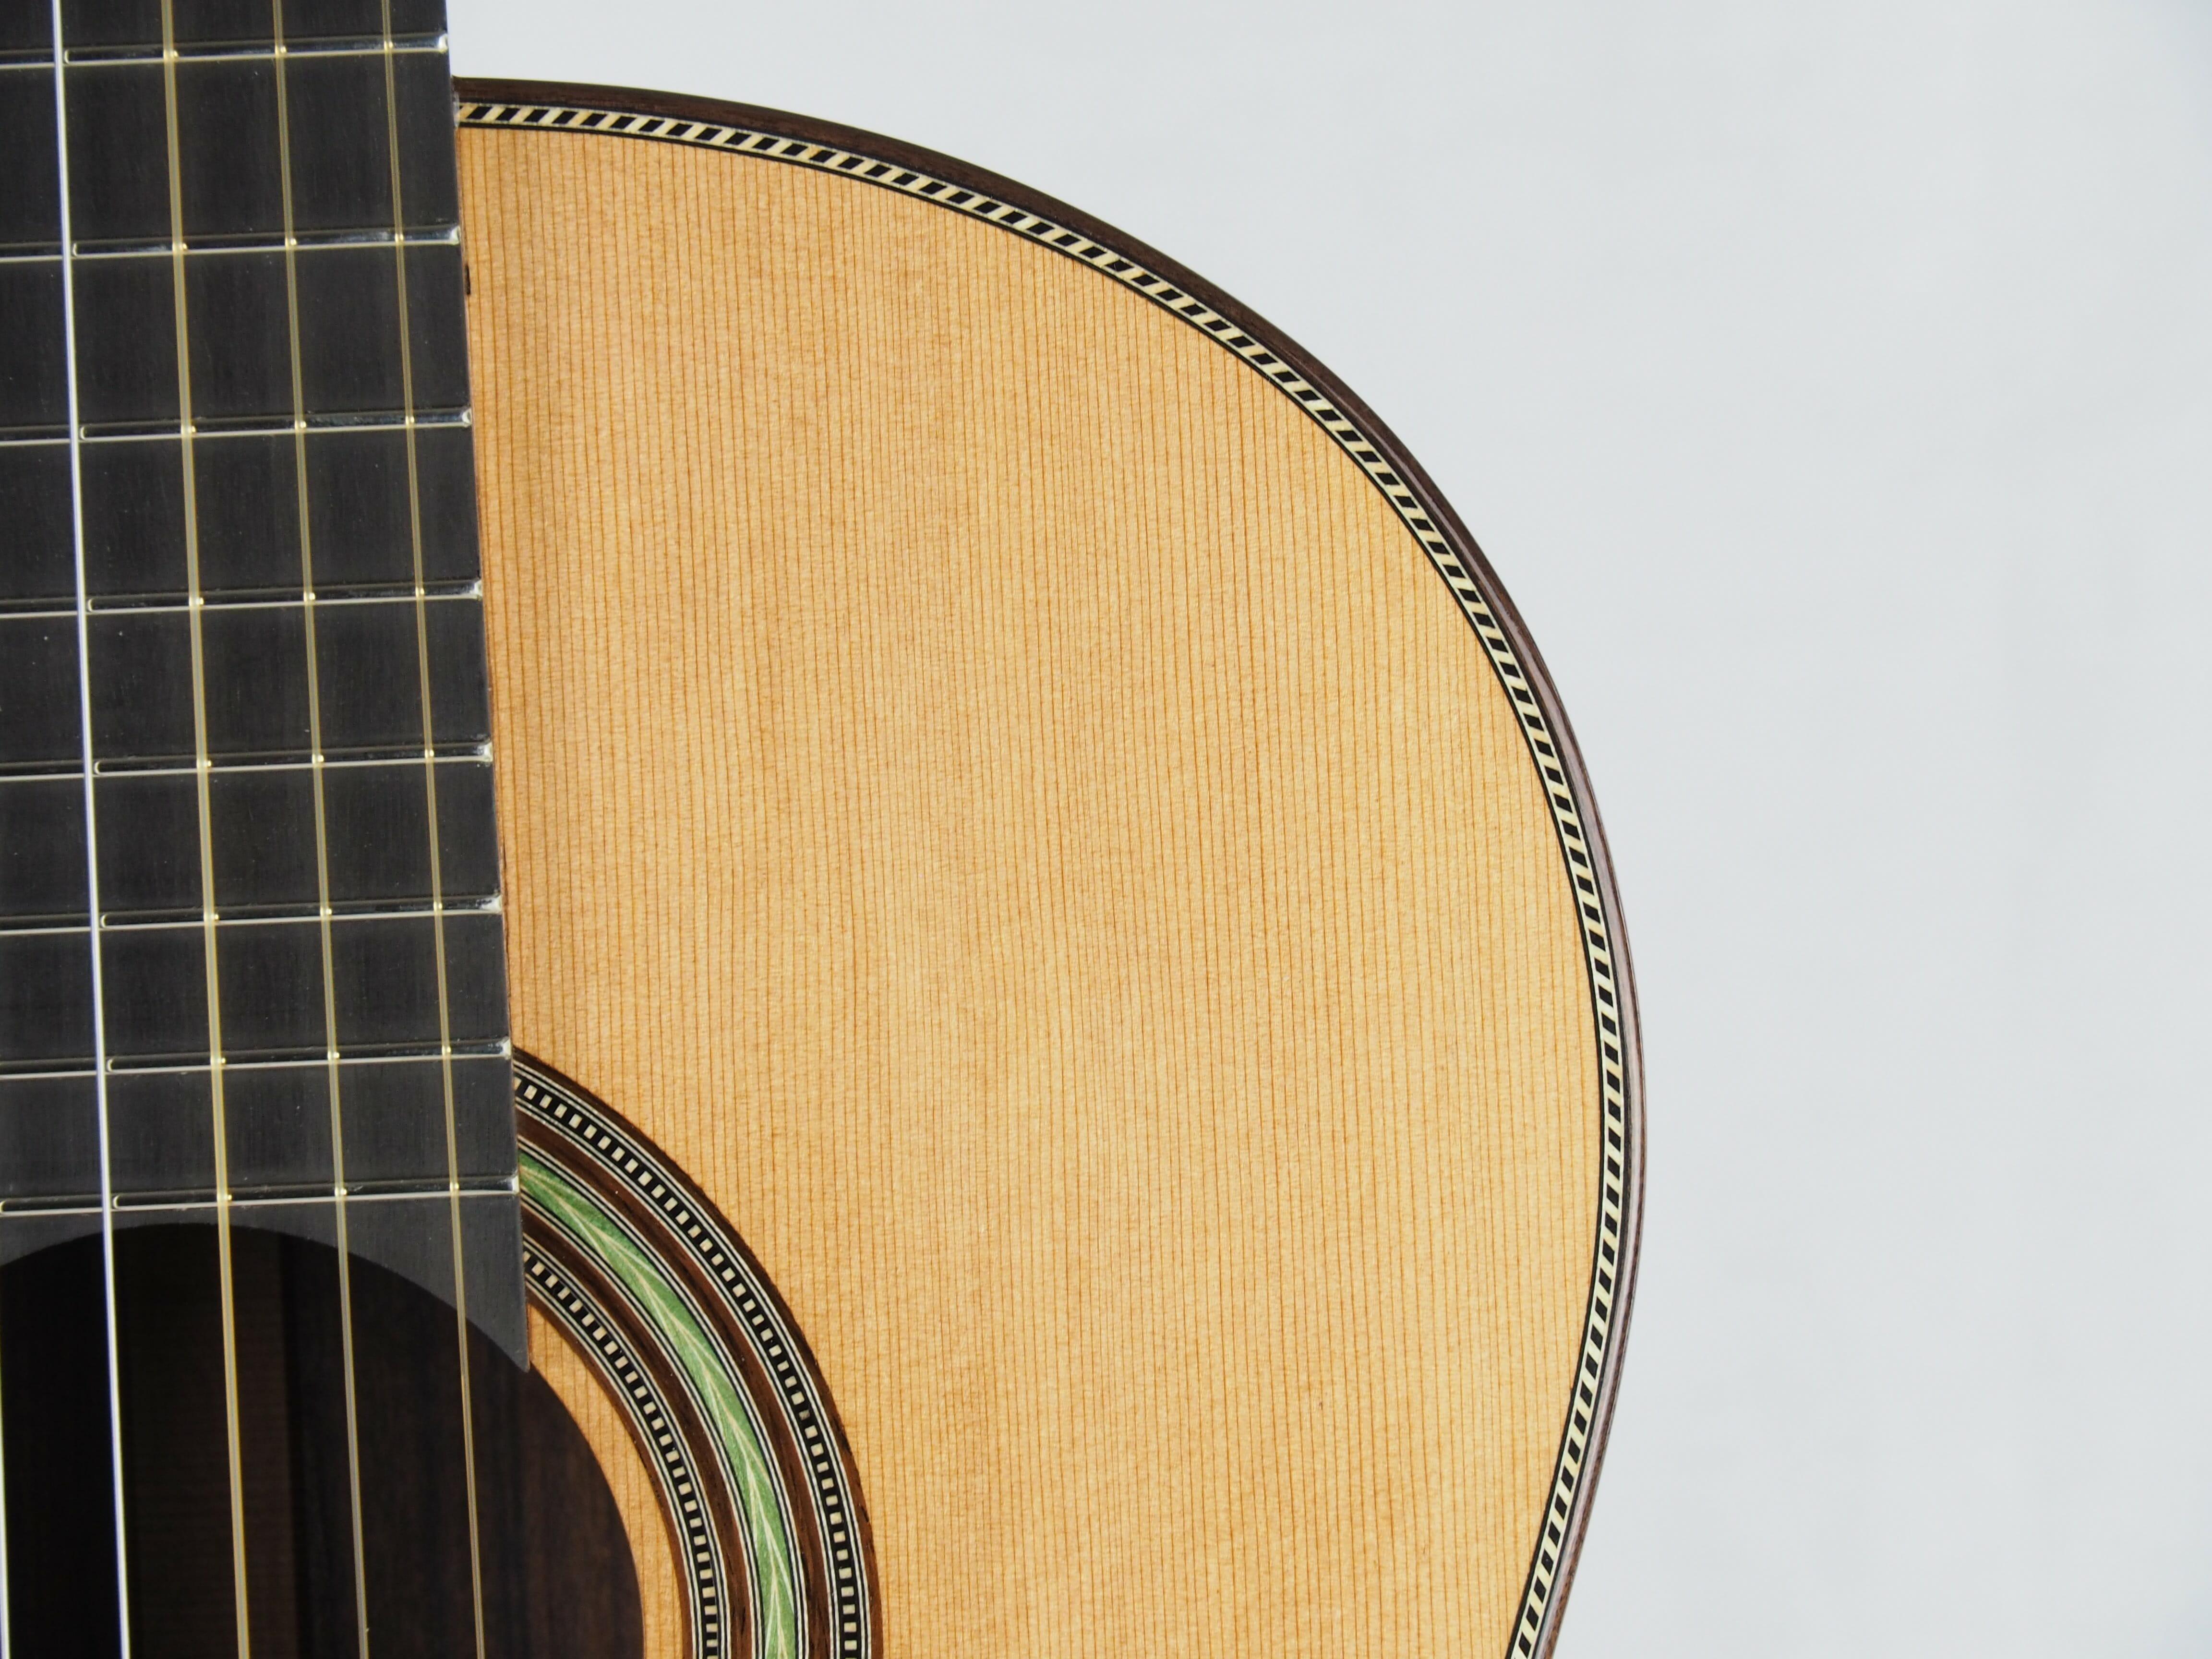 Luthier stanislaw Partyka guitare classique barrage lattice